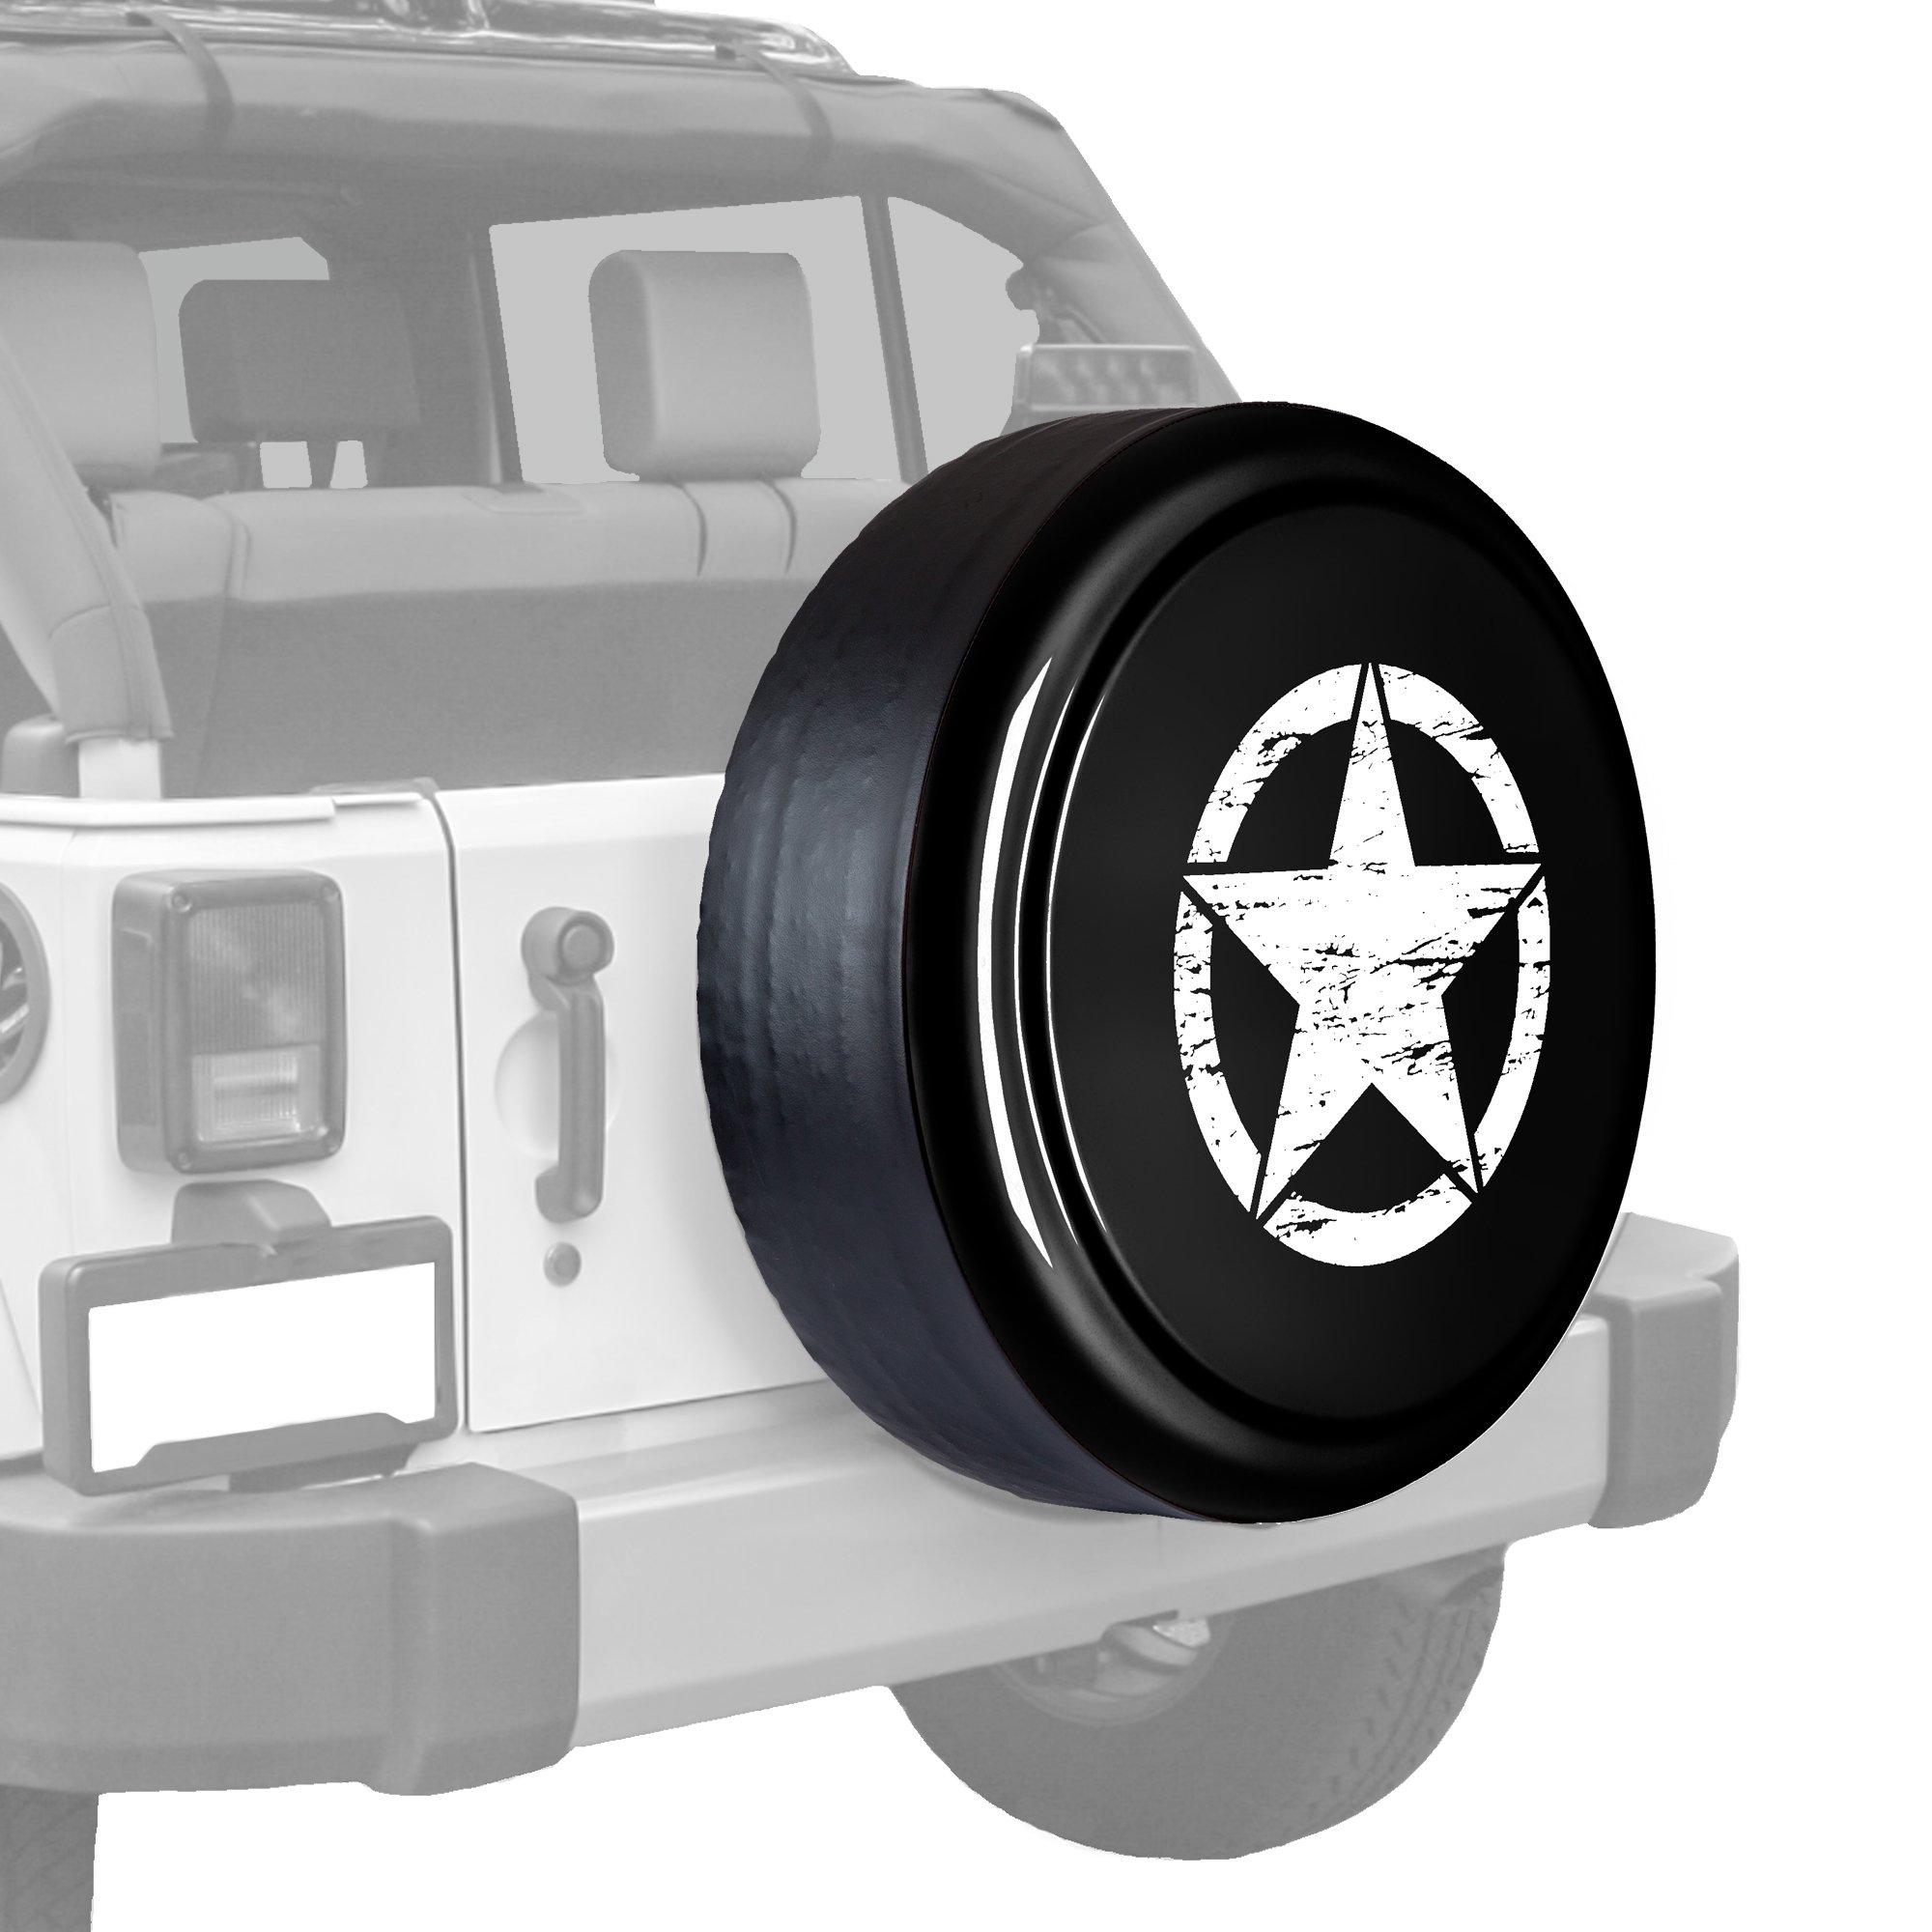 32'' Distressed Star - Rigid Tire Cover (Plastic Face & Vinyl Band) - 2007-2015 Jeep Wrangler (JK)- Unpainted Black